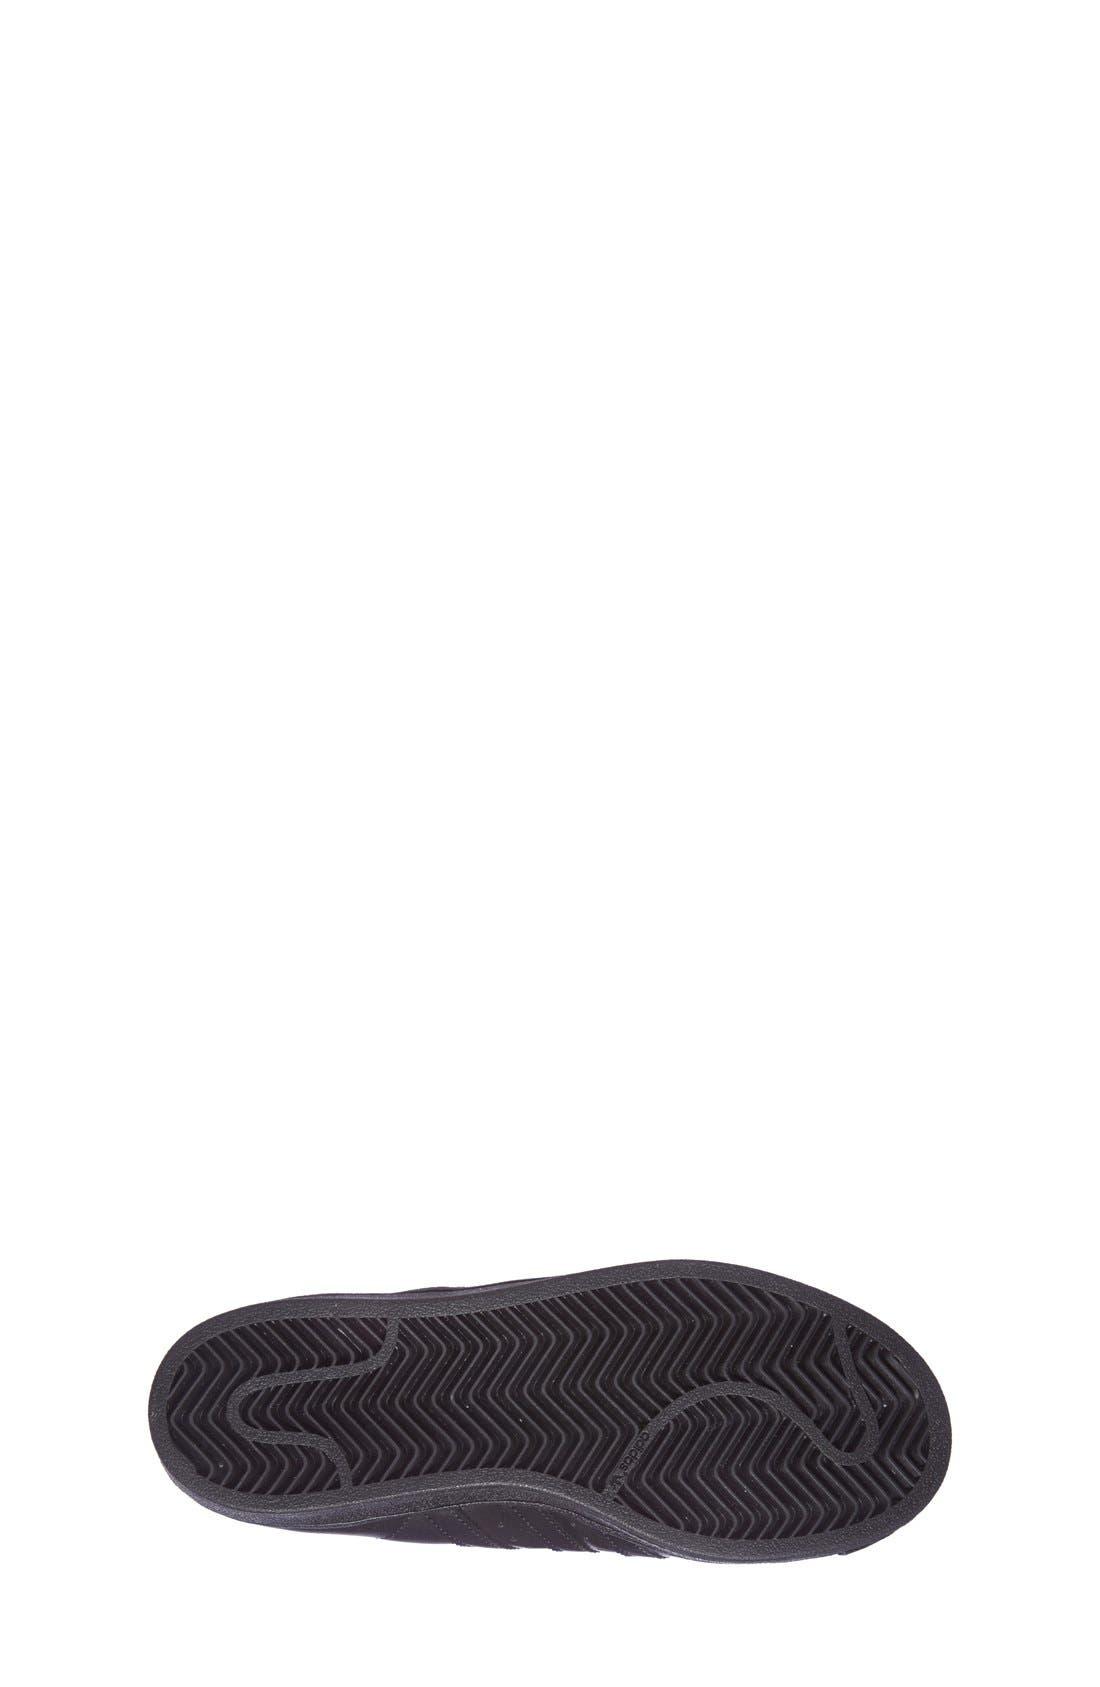 'Pro Model' High Top Sneaker,                             Alternate thumbnail 3, color,                             001